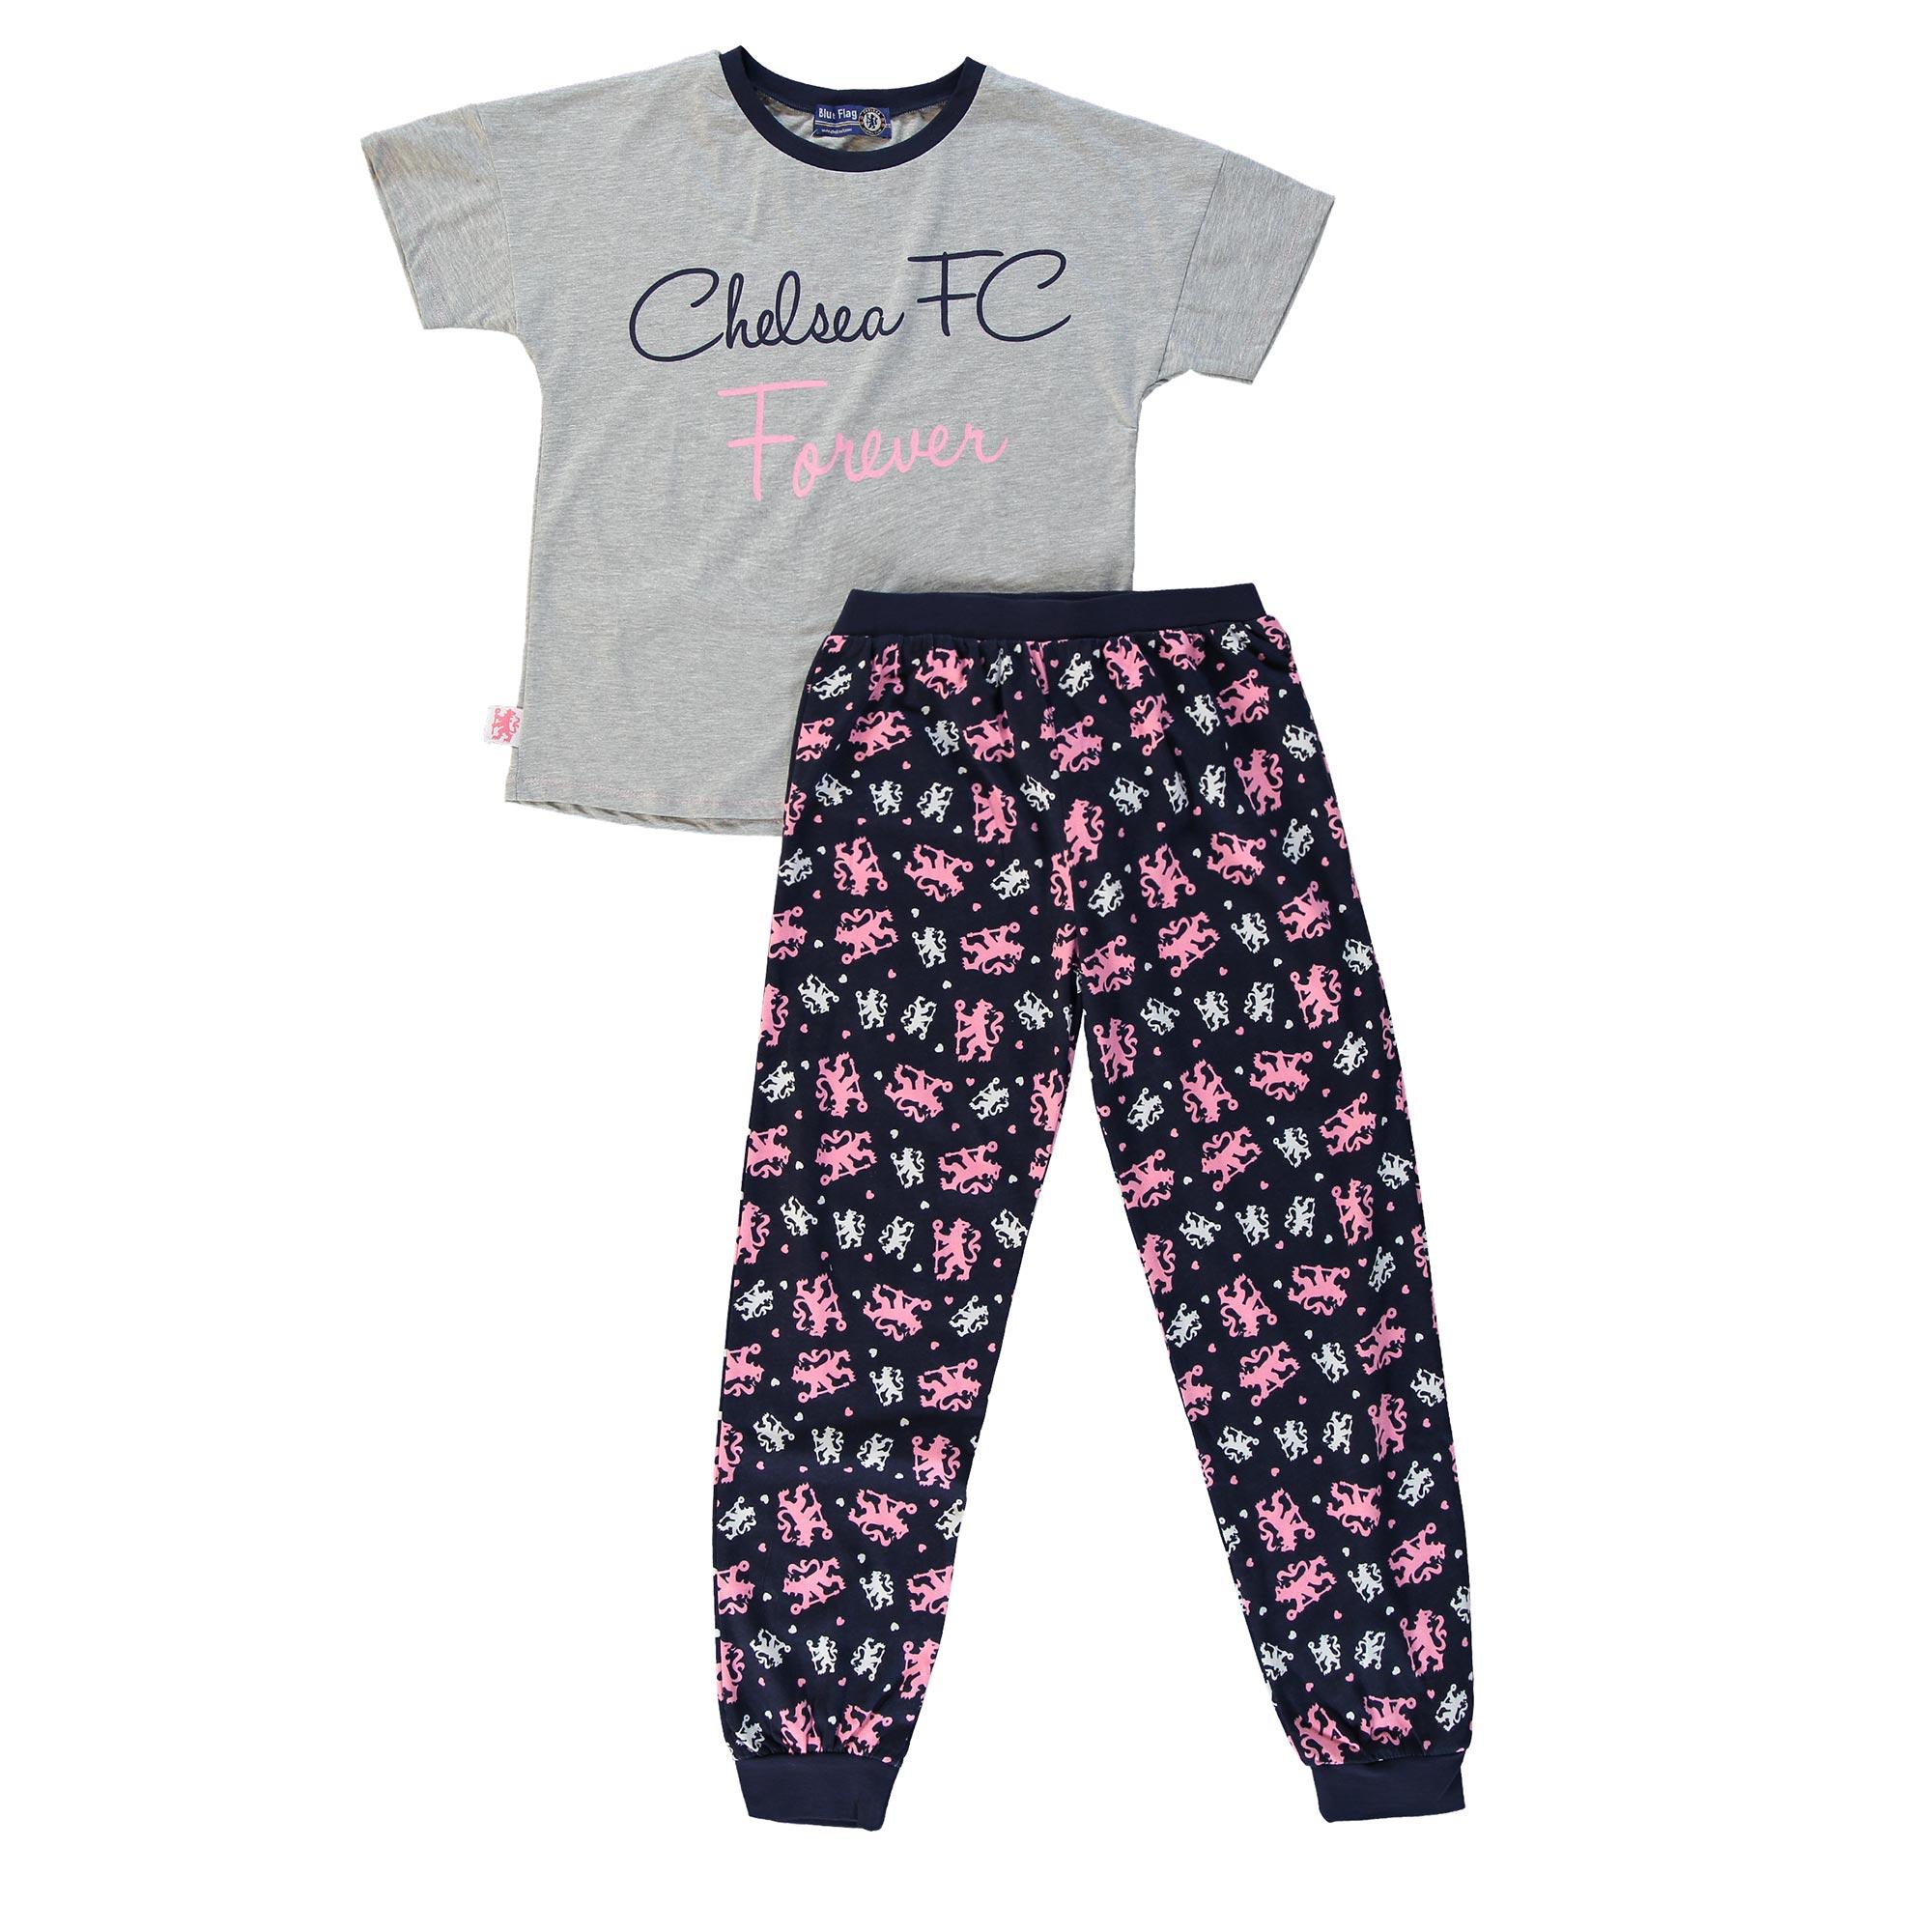 Chelsea FC Forever Pyjamas - Grey Marl/Navy - Older Girls